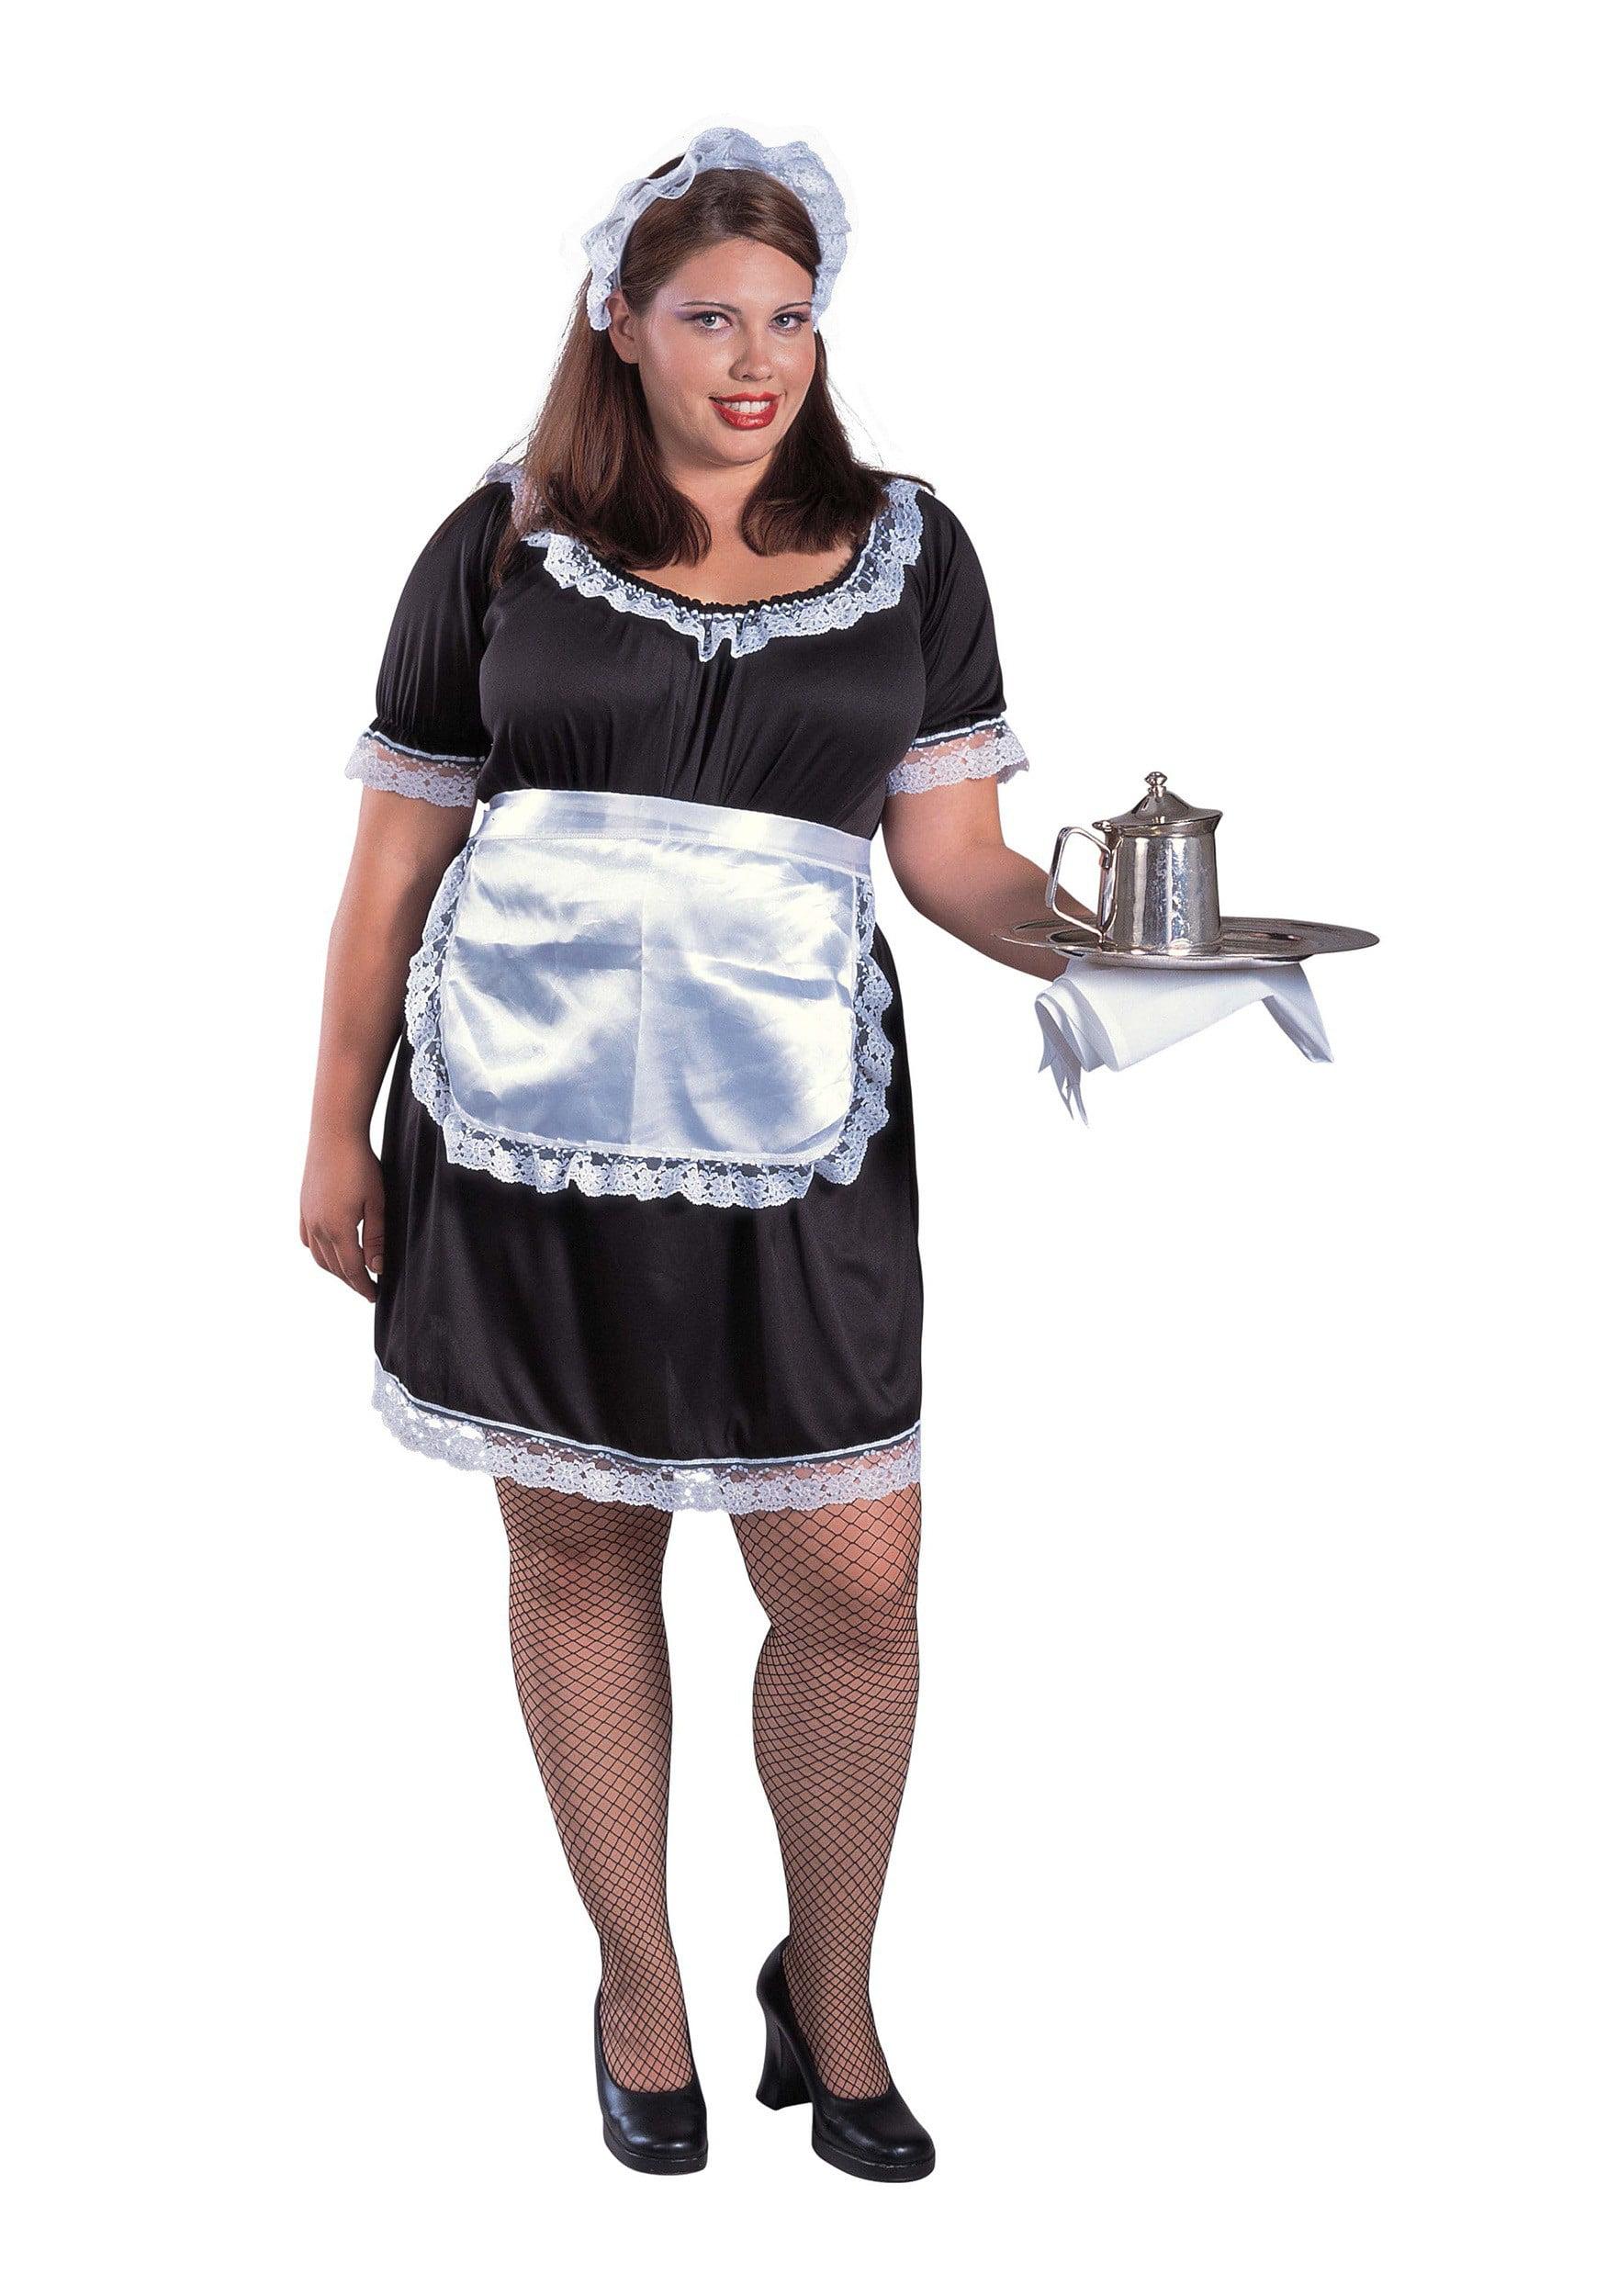 sc 1 st  Walmart & Womenu0027s Plus Size French Maid Costume - Walmart.com